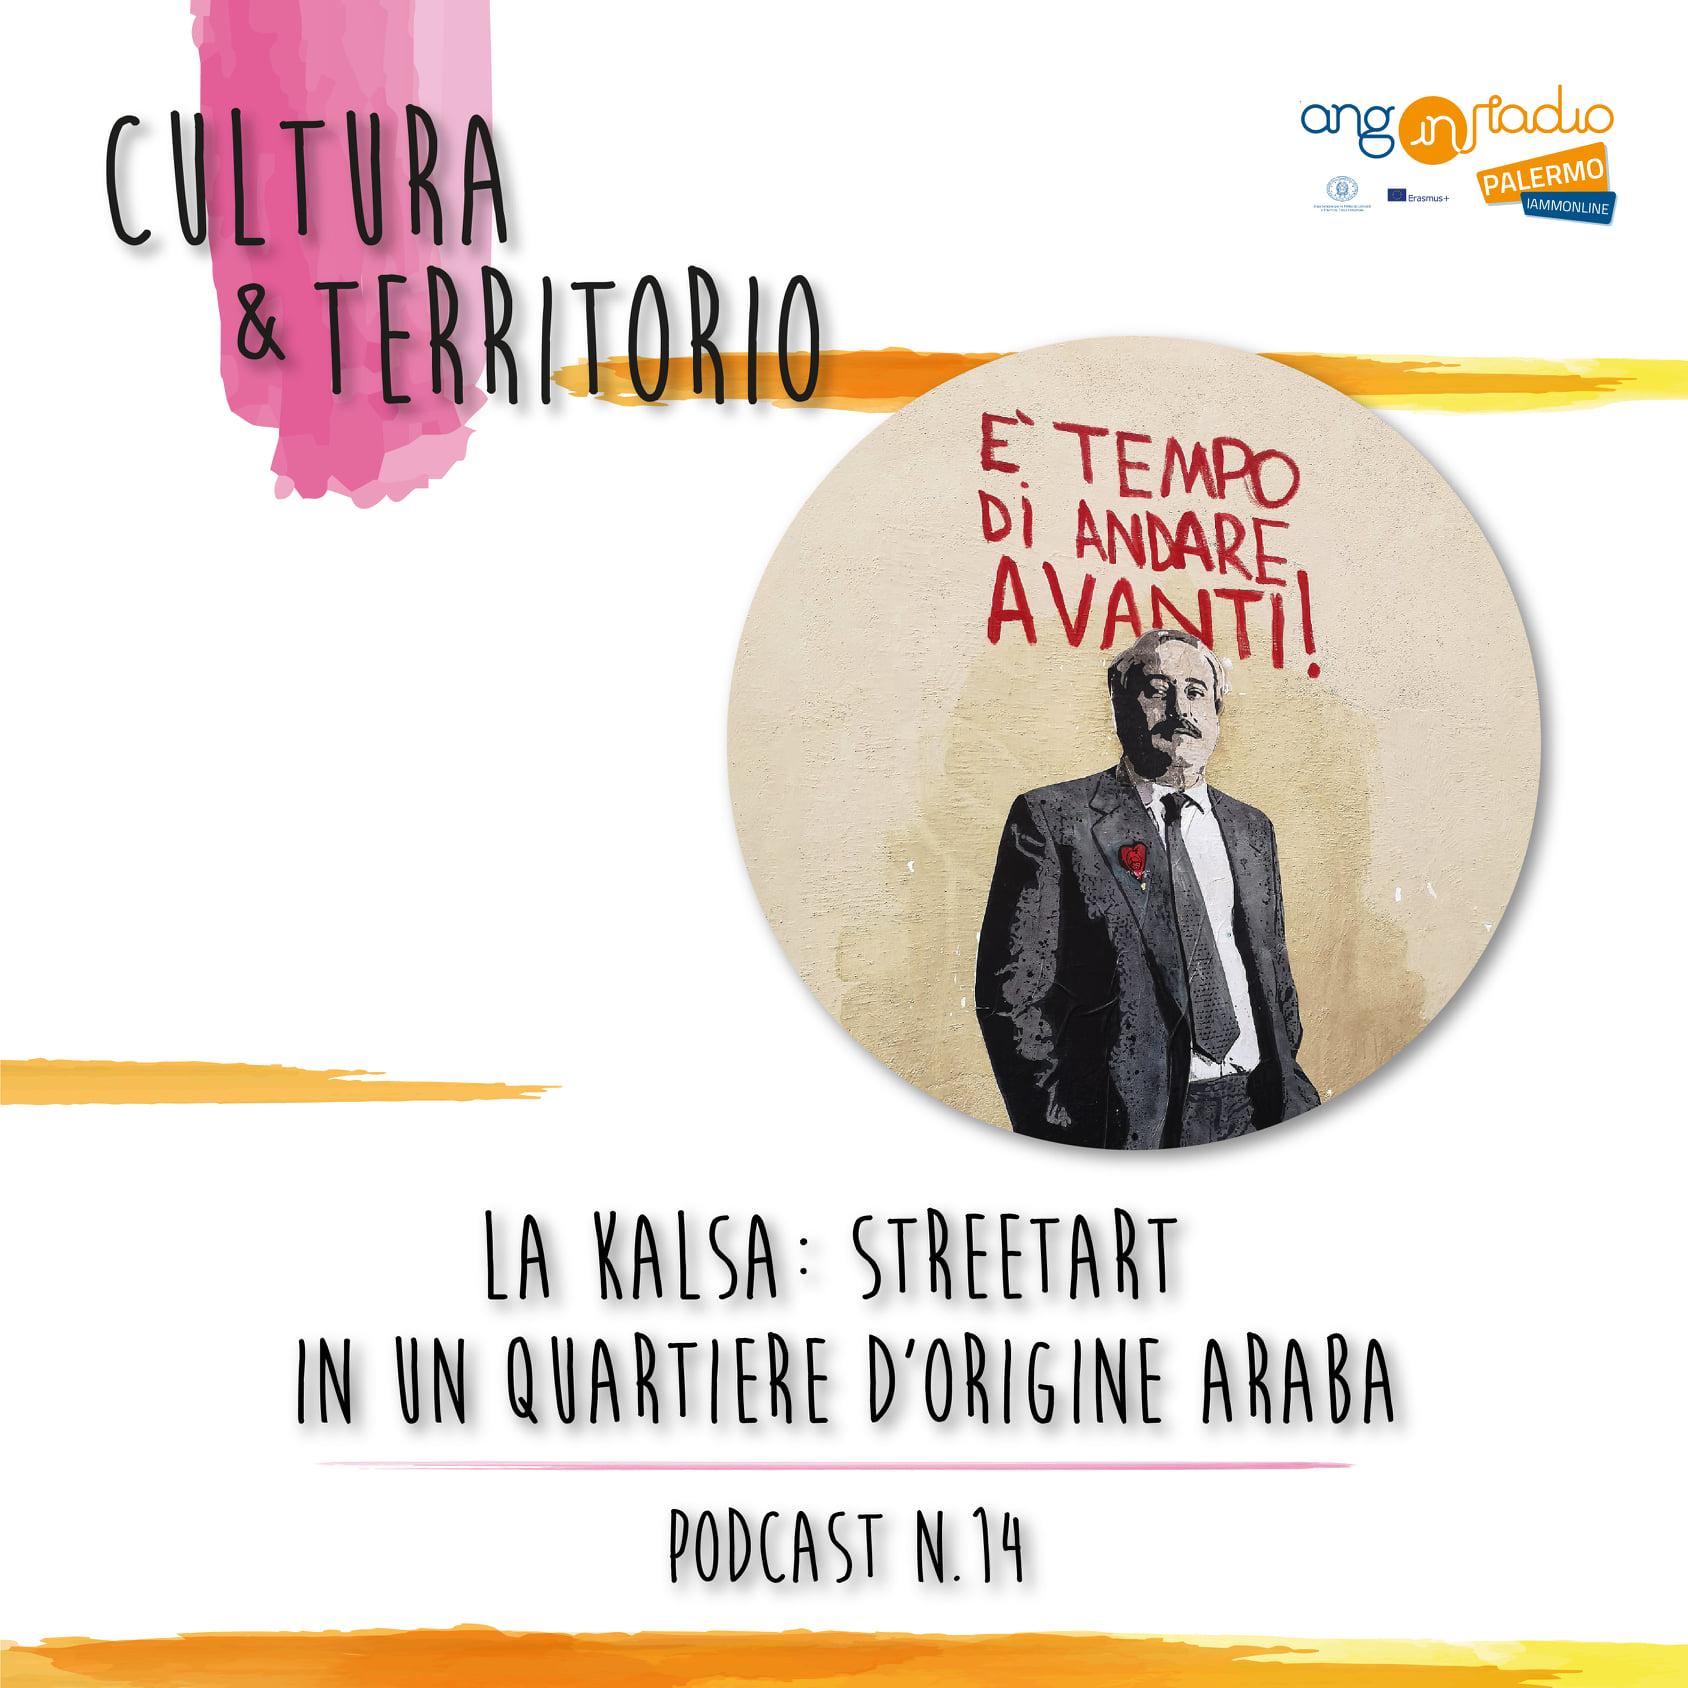 Podcast 14: Street Art, la Kalsa